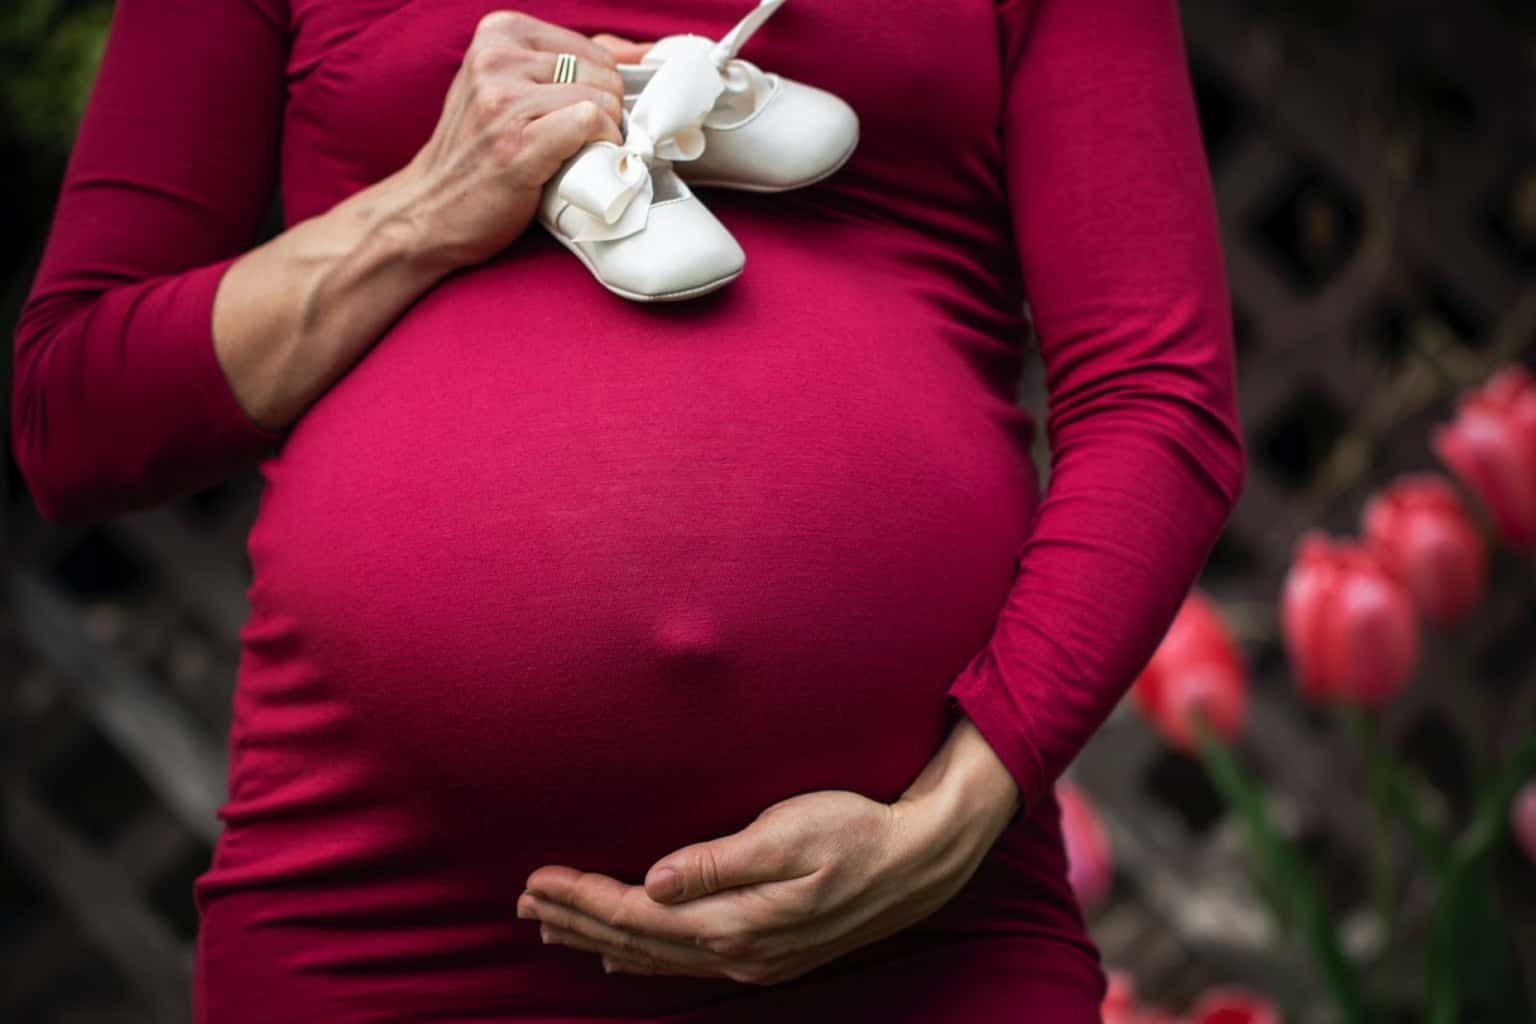 Helping your friend through their first pregnancy